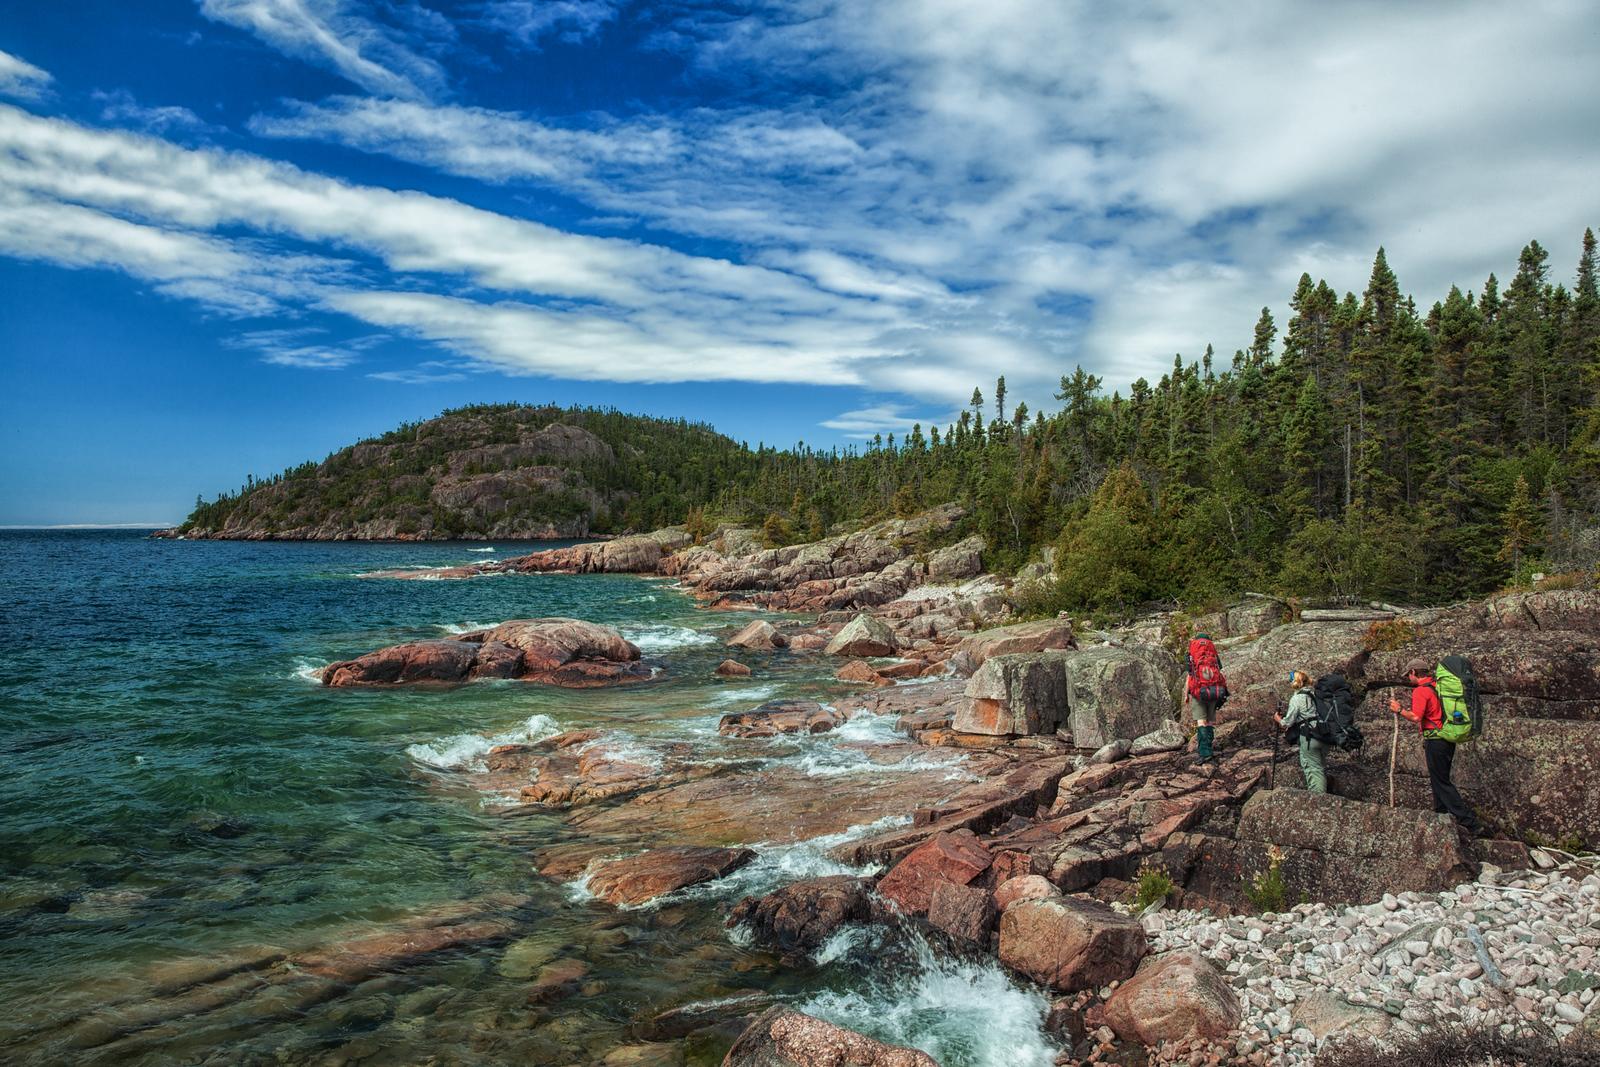 Hiking the Pukaskwa Coastal Trail in Ontario.